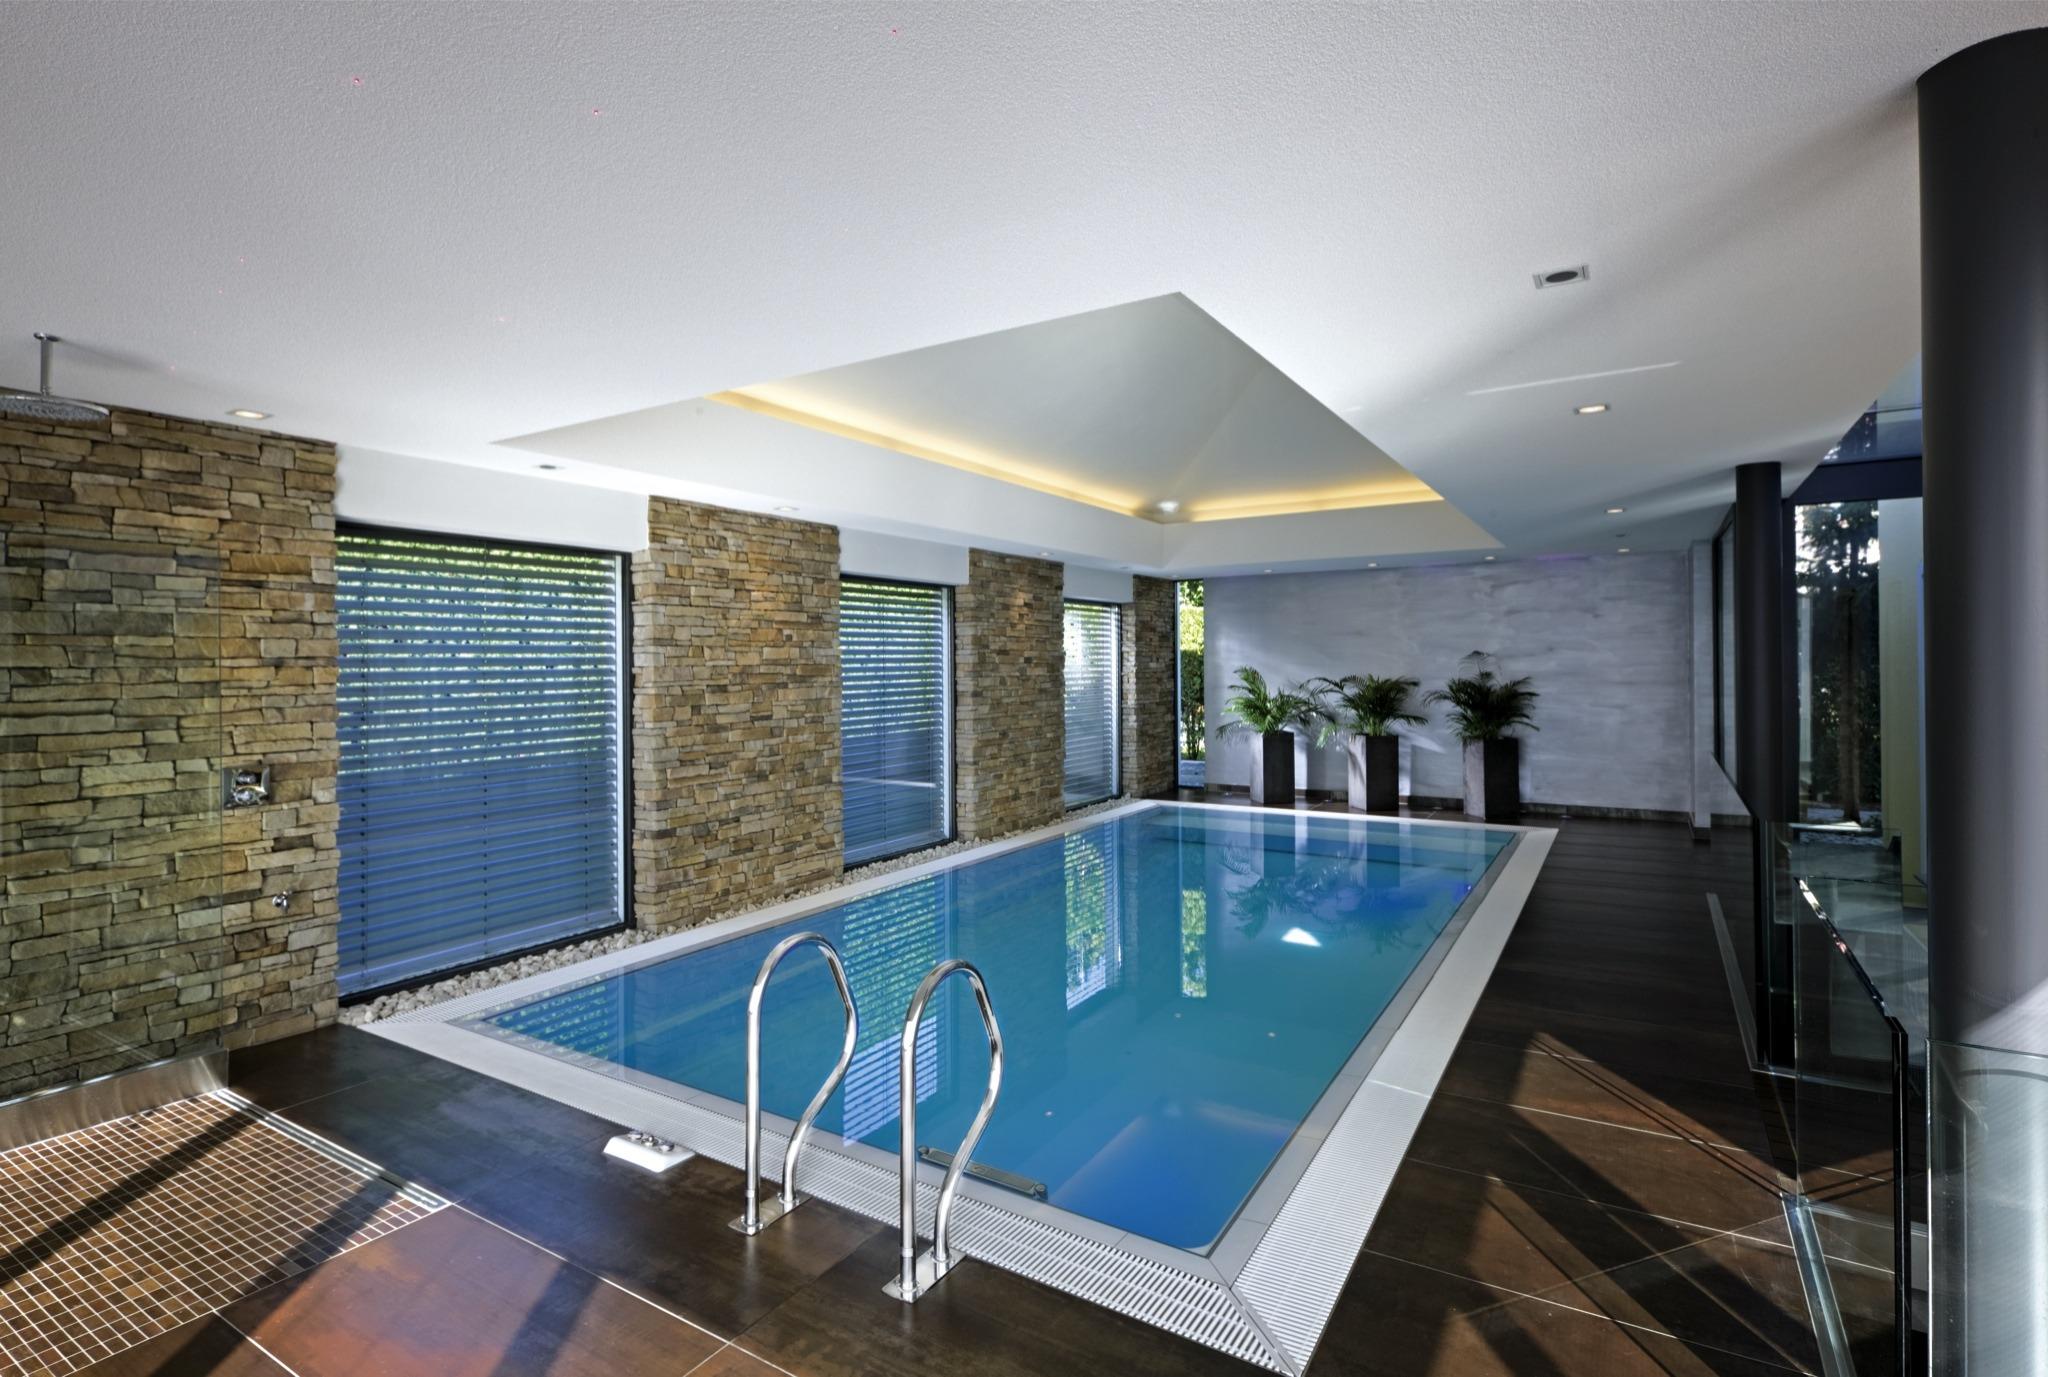 neubau pools aus beton oder edelstahl schwimmbadservice. Black Bedroom Furniture Sets. Home Design Ideas